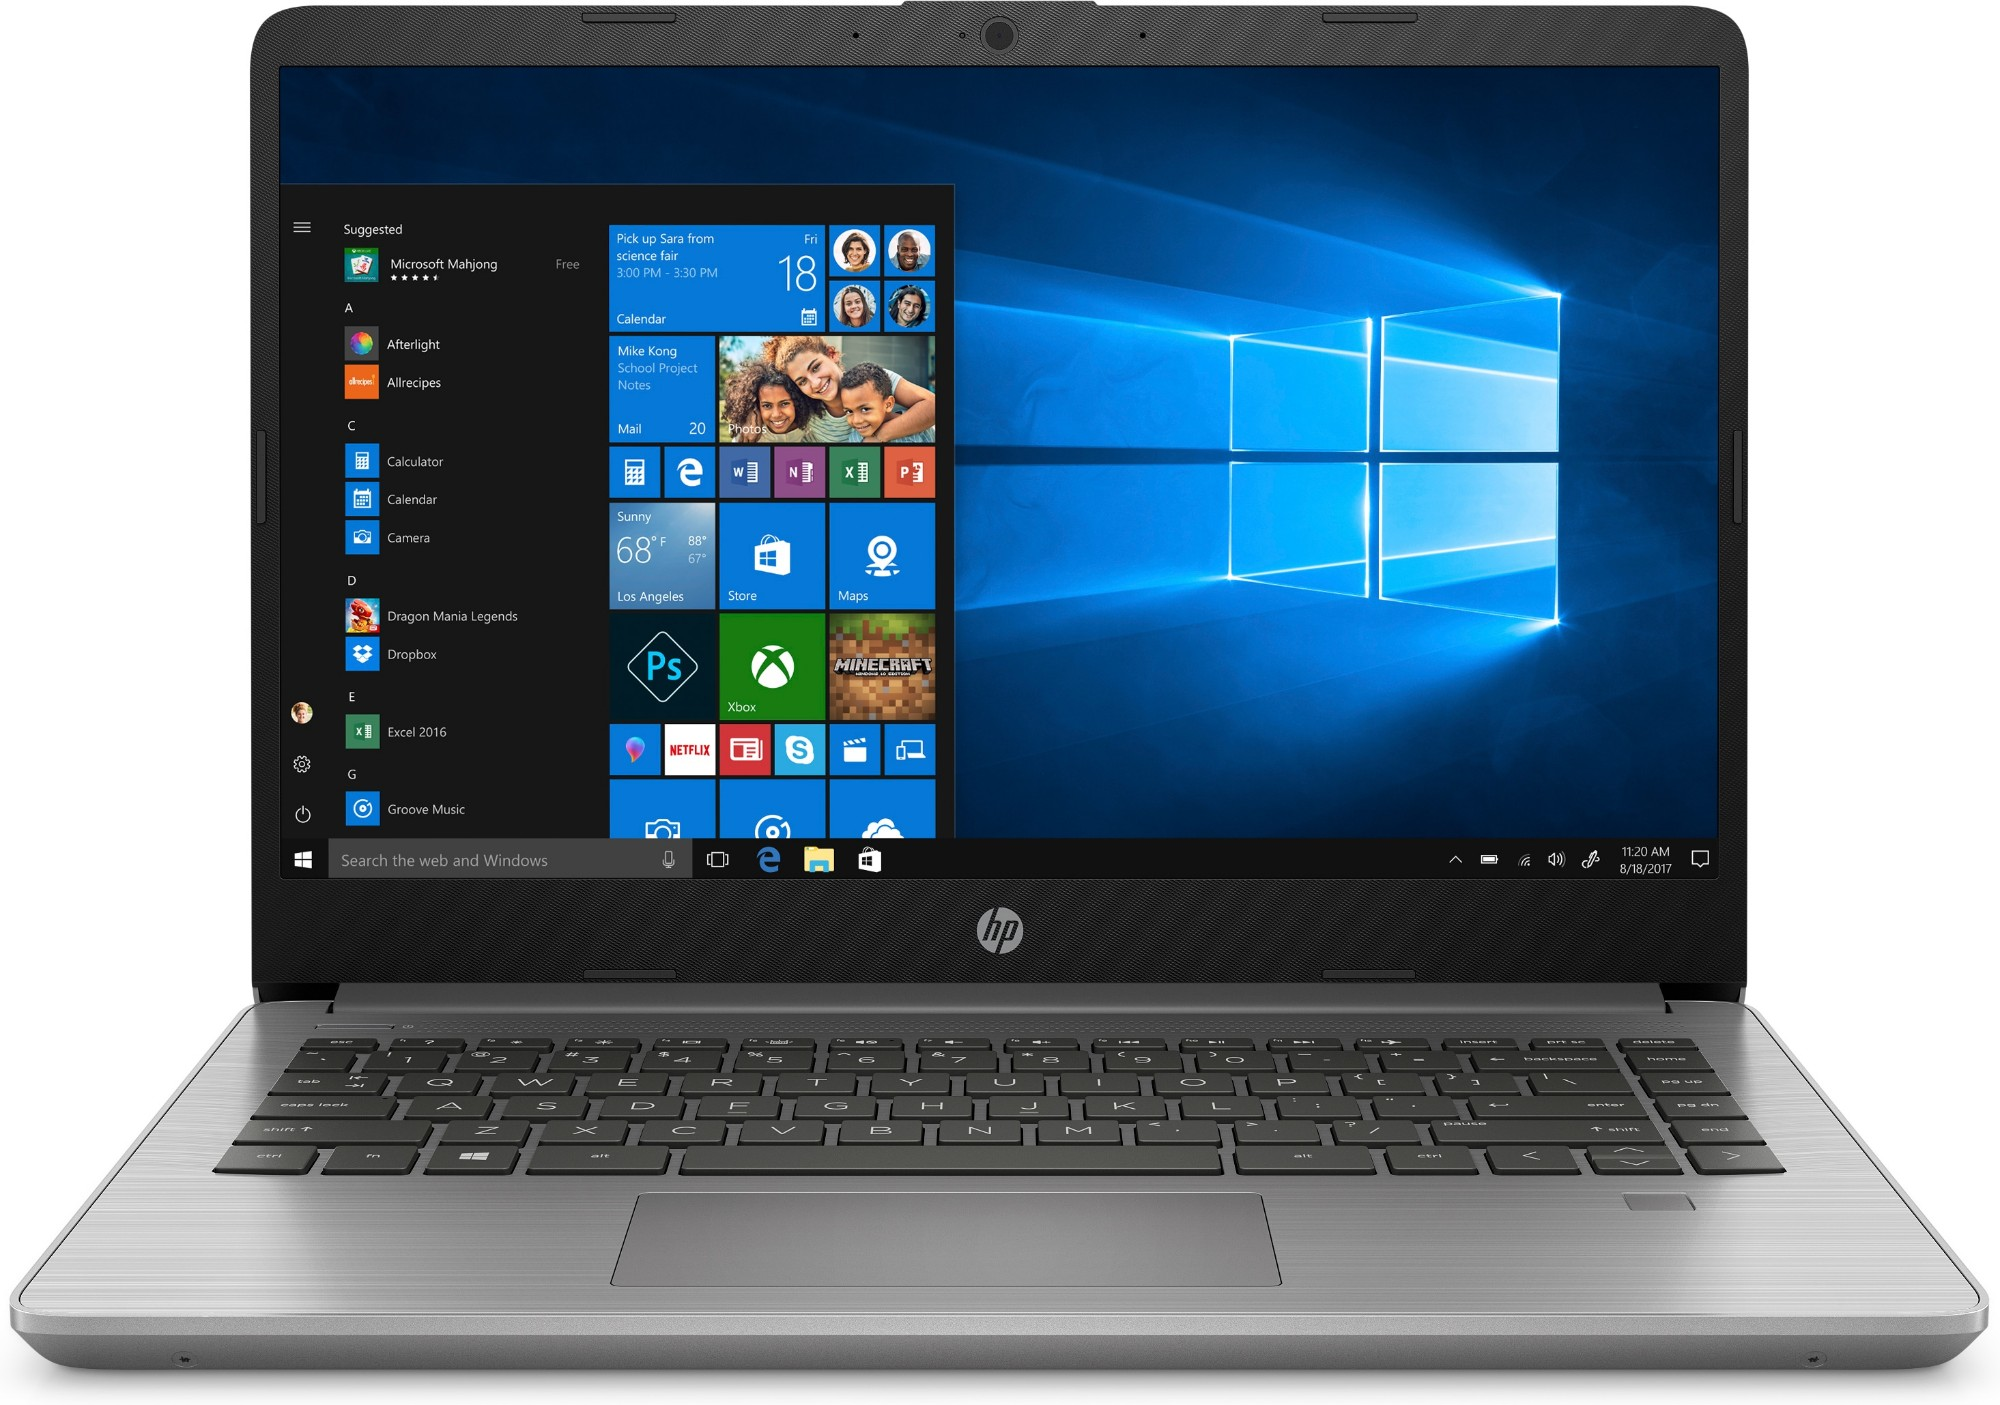 "HP Prenosni računalnik 340S G7 Portátil Plata 35,6 cm (14"") 1920 x 1080 Pixeles Intel® Core™ i7 de 10ma Generación 8 GB DDR4-SDRAM 512 GB SSD Wi-Fi 6 (802.11ax) Windows 10 Pro"